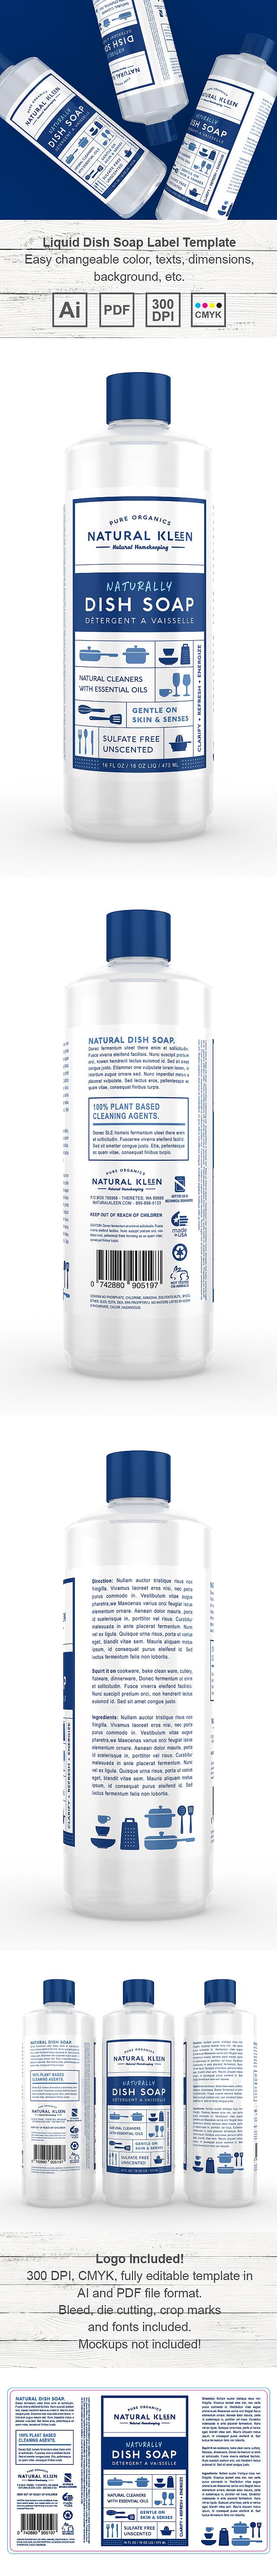 Liquid Dish Wash Label Template